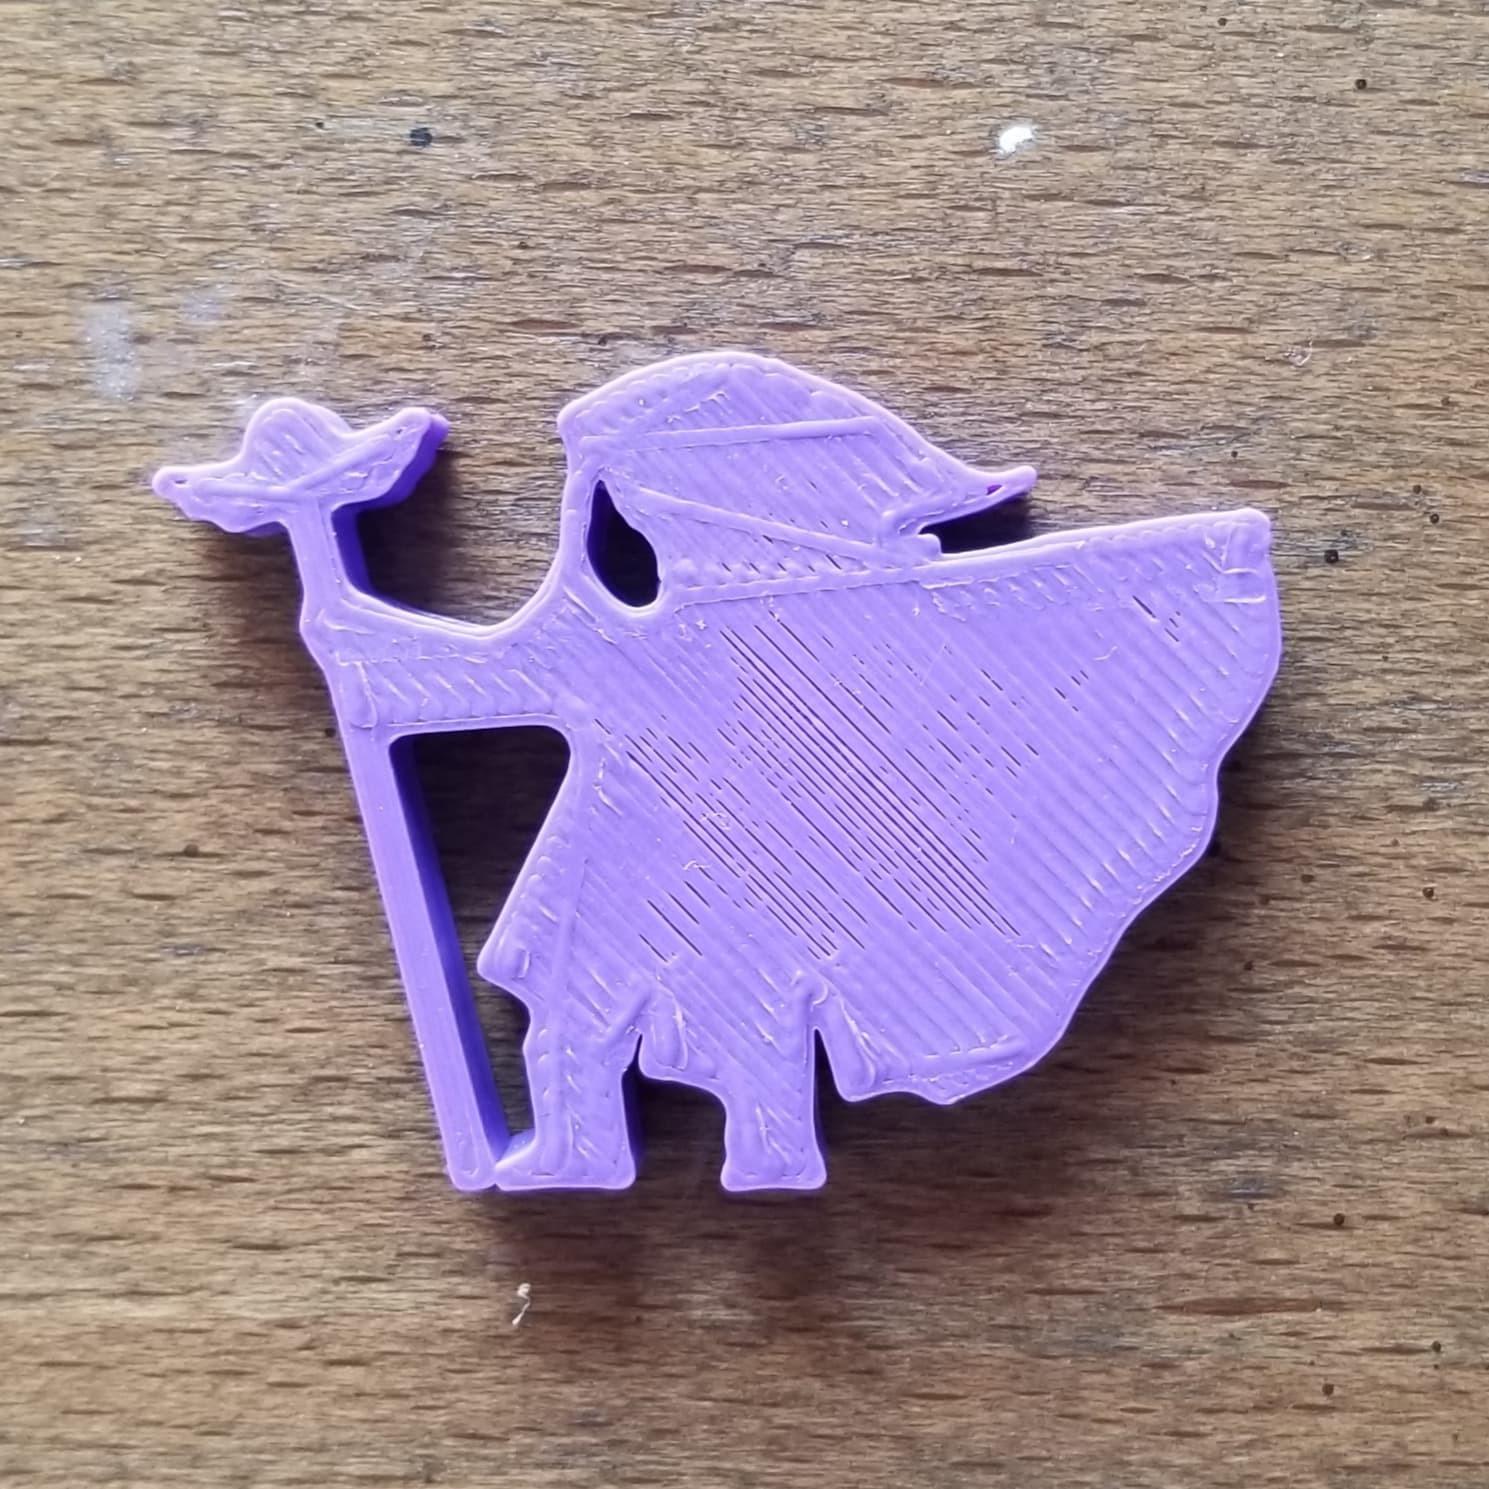 Heavy Cloak Winged Staff.jpg Download STL file Heavy Cloak Wizard With Winged Staff Meeple • Template to 3D print, Ellie_Valkyrie